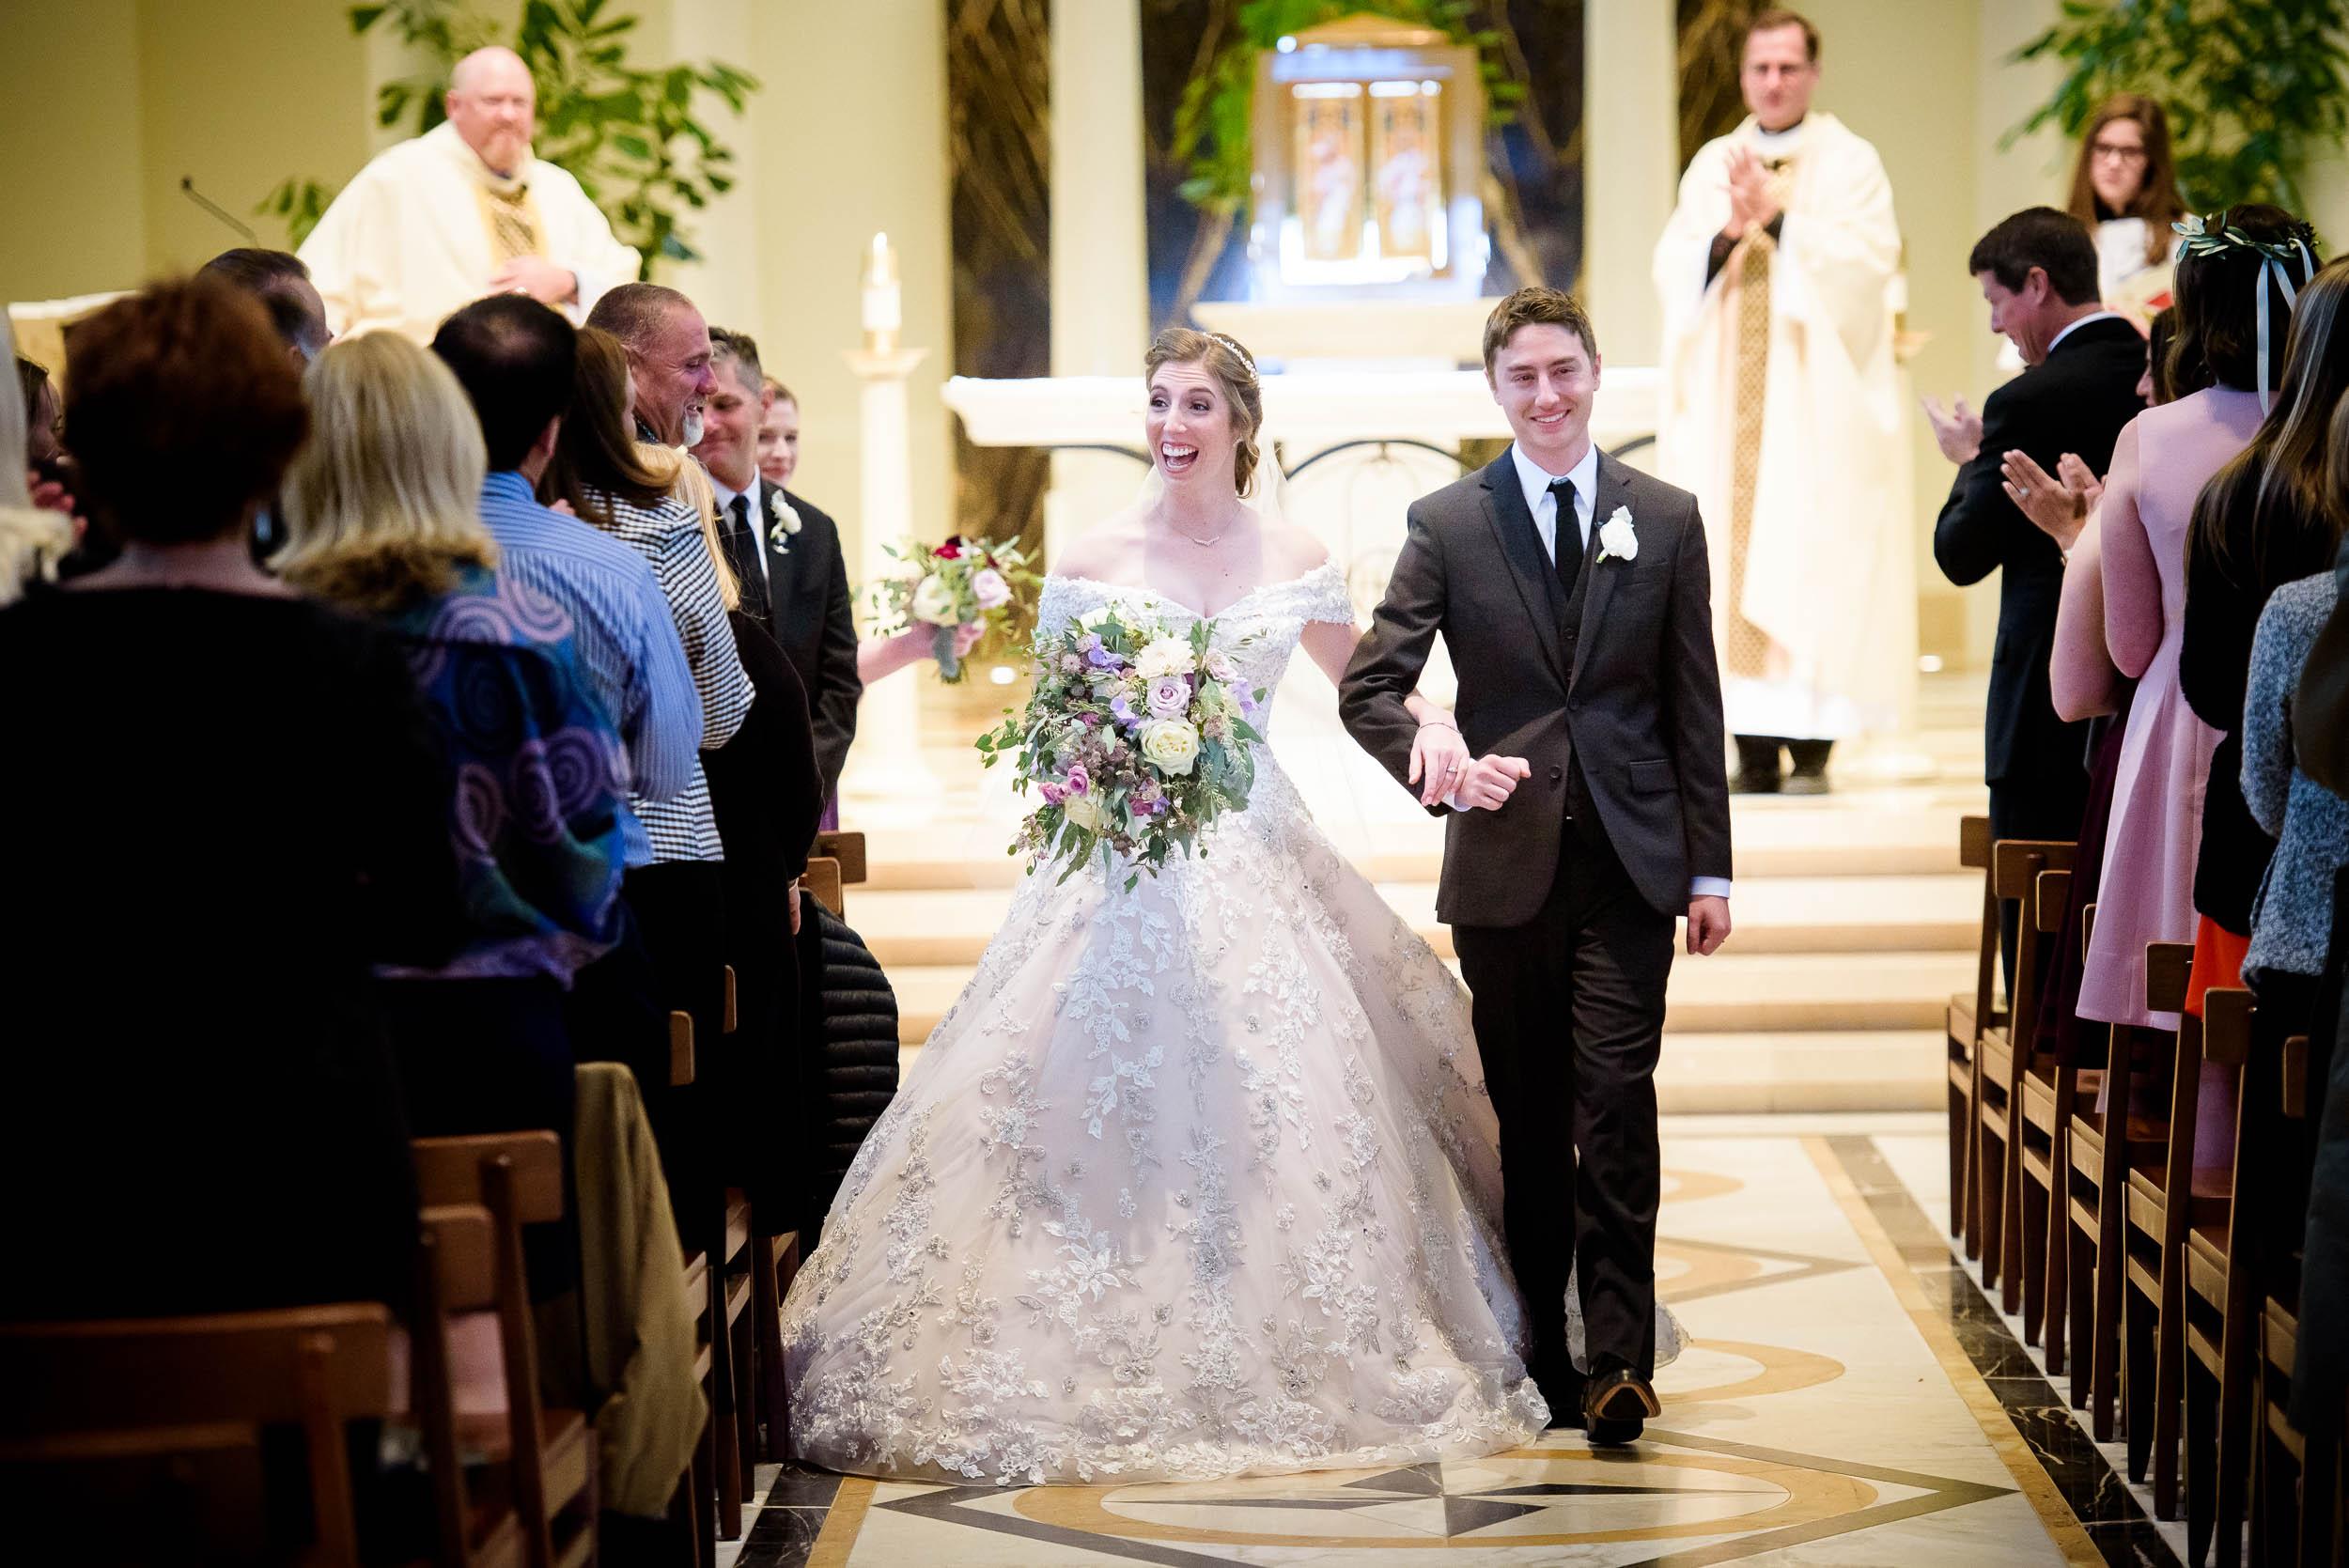 Bride and groom walk down the aisle during a wedding ceremony at Madonna Della Strada.